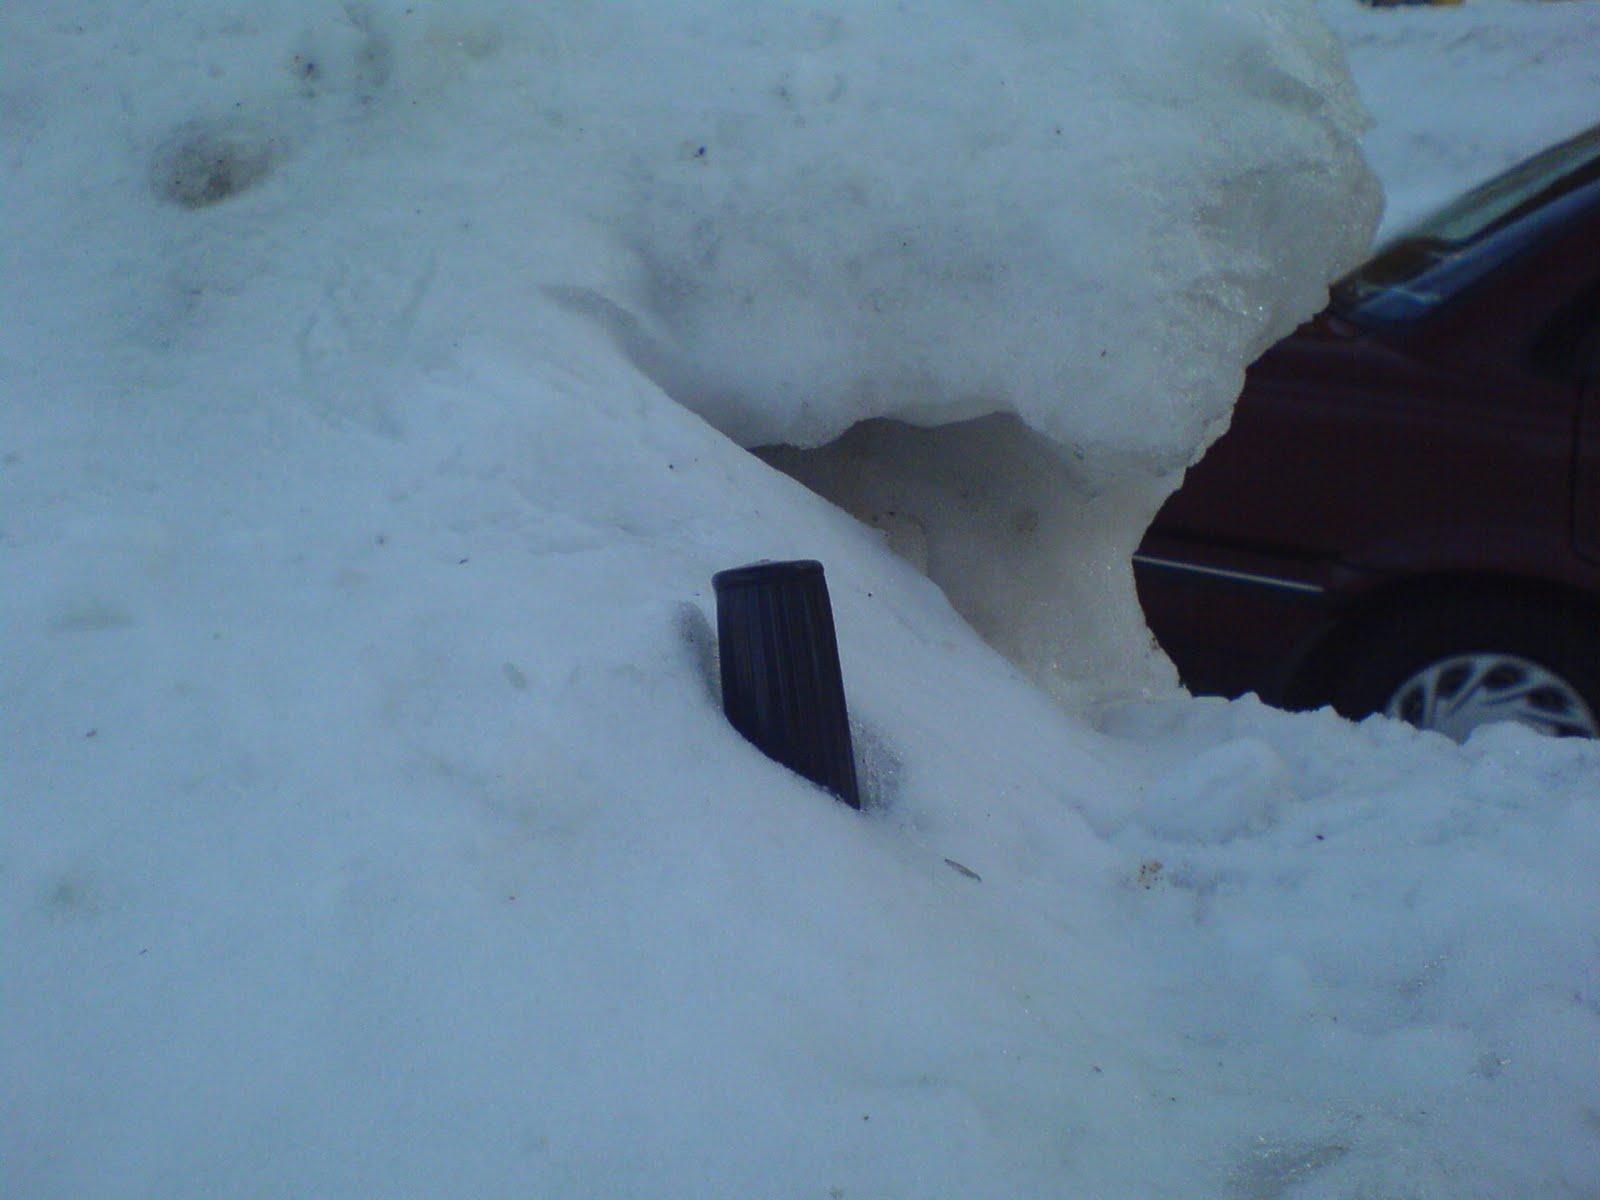 63°49'LatitudineNord: March 2010